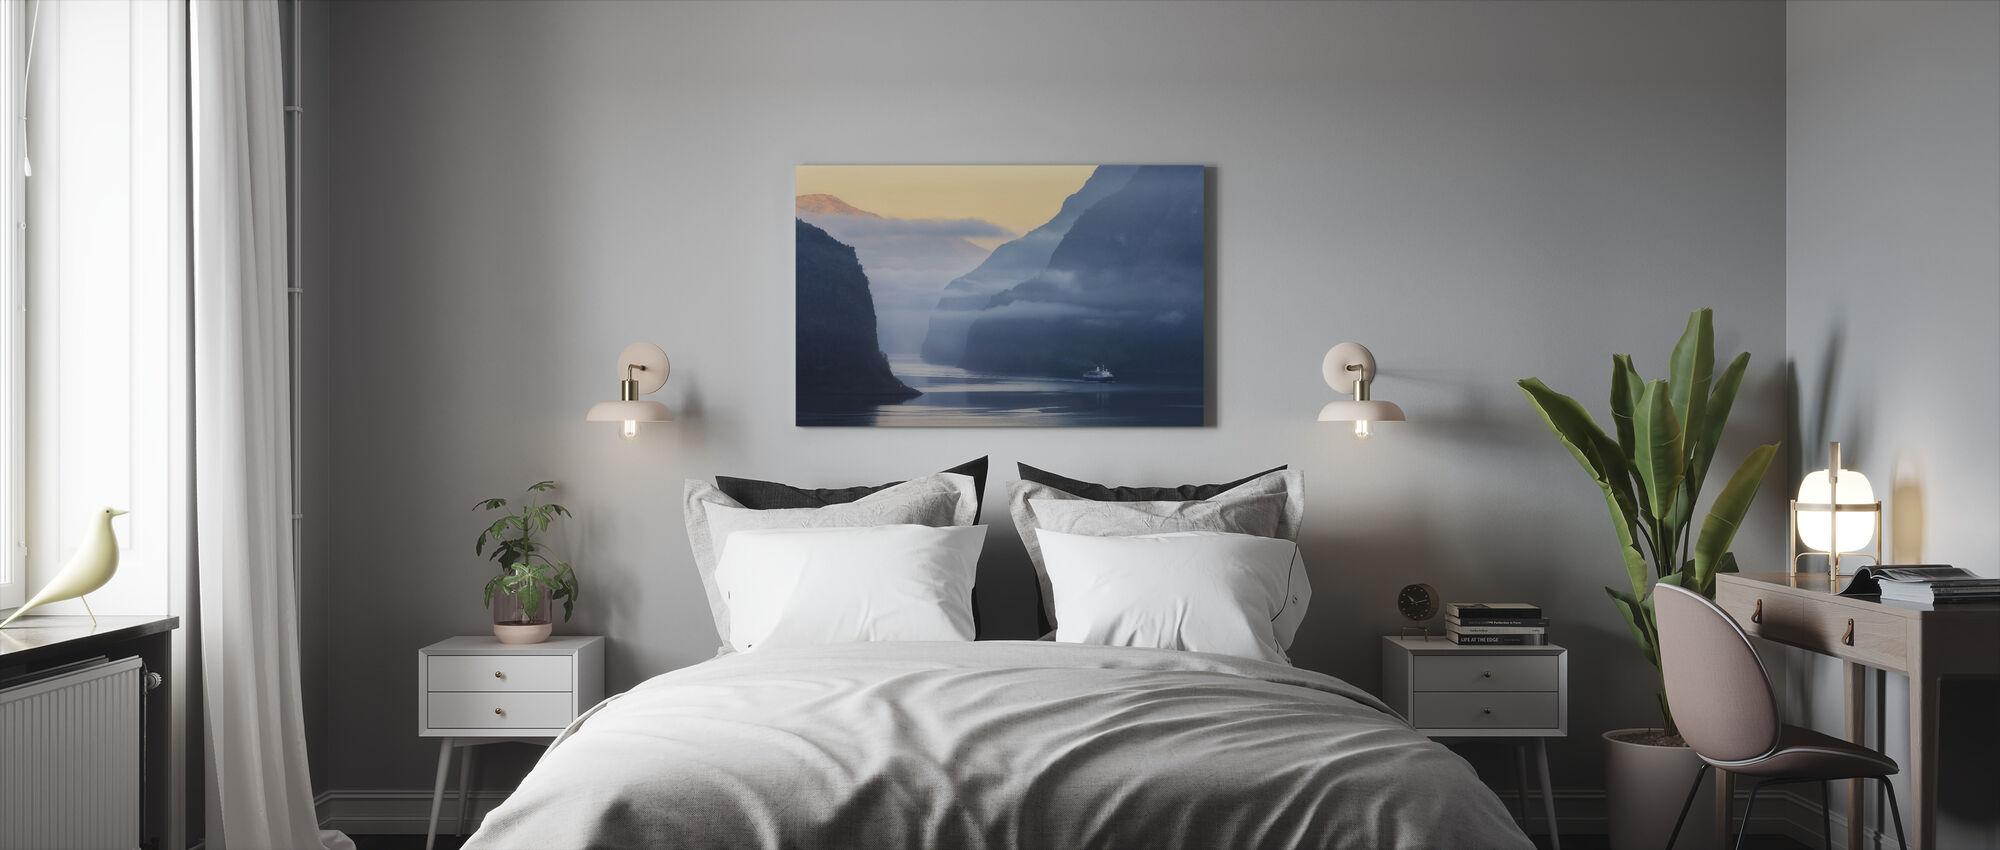 Norwegian Fjord in Fog - Canvas print - Bedroom